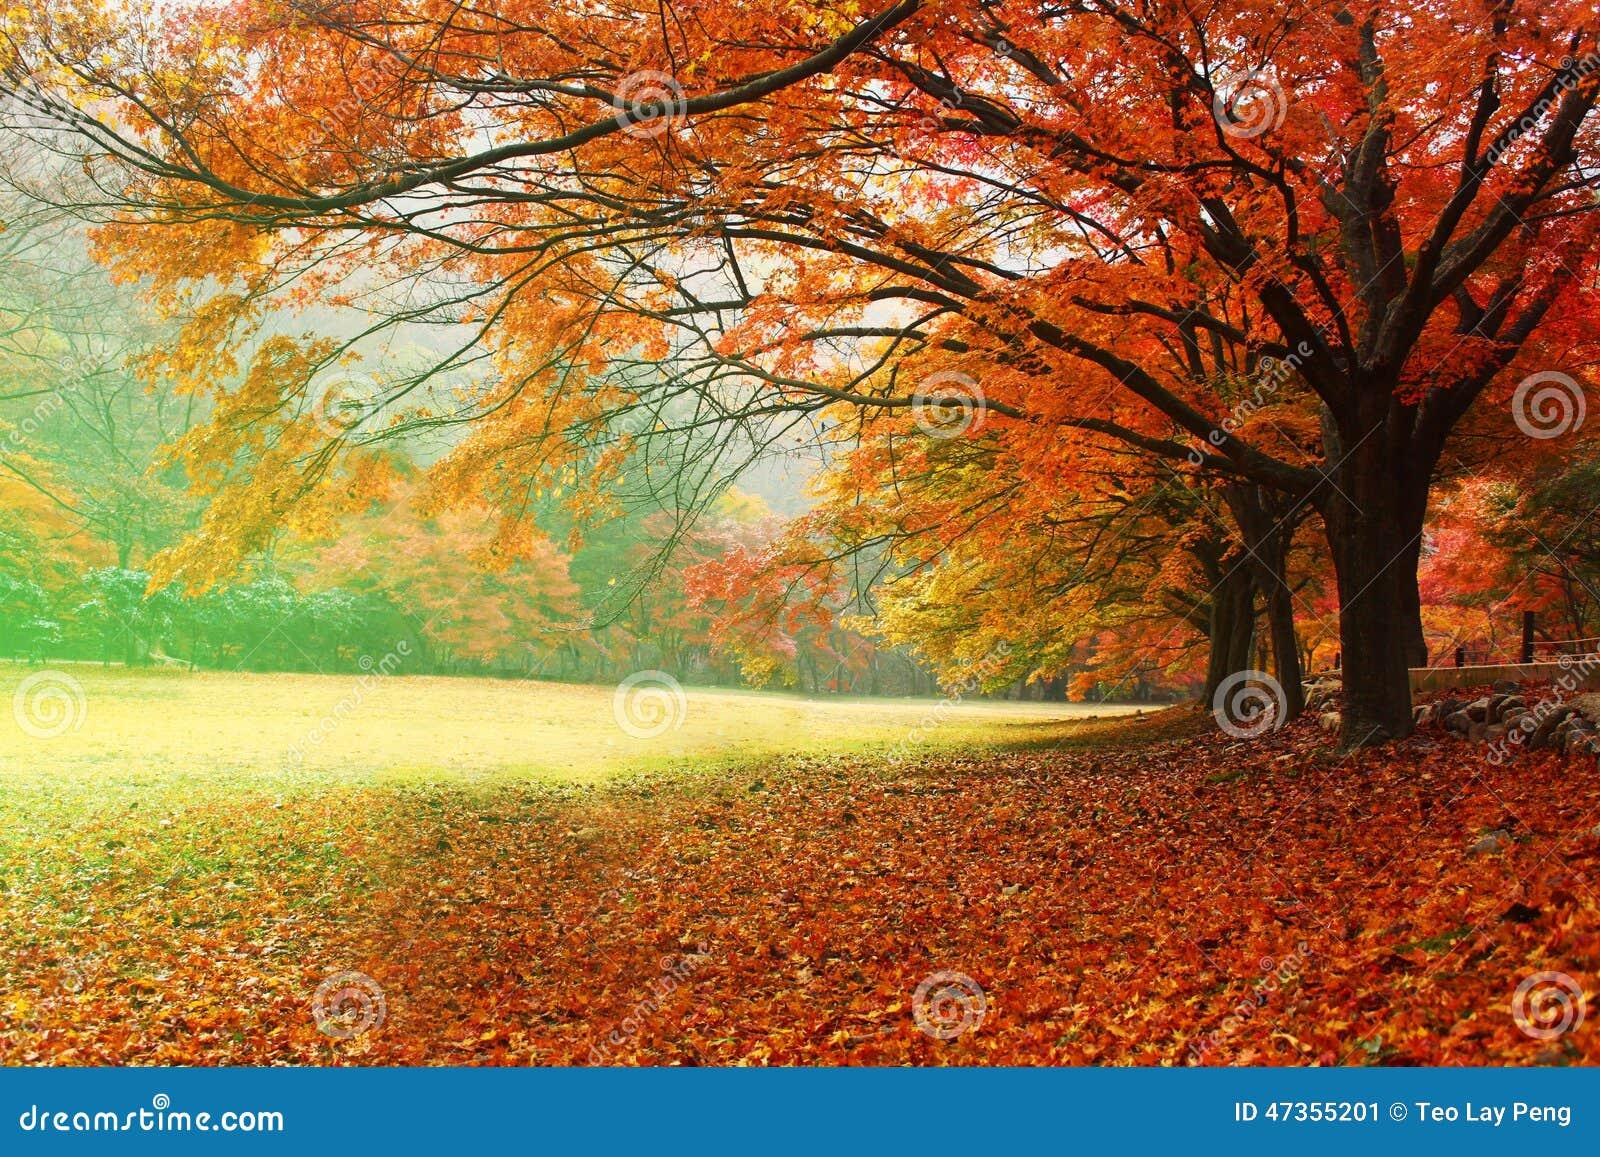 Red leaf seasons